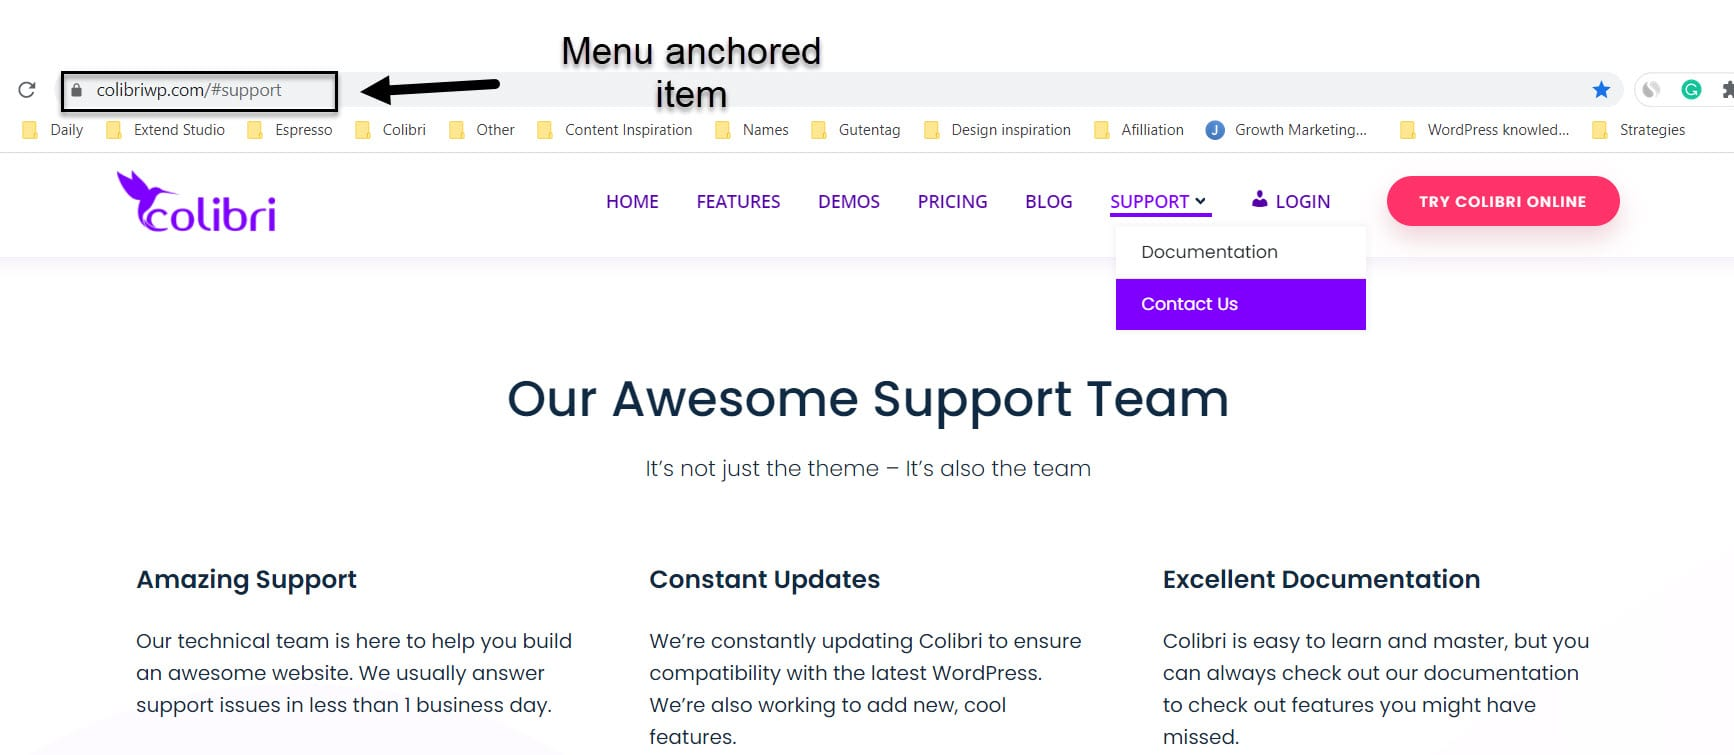 Anchored WordPress menu